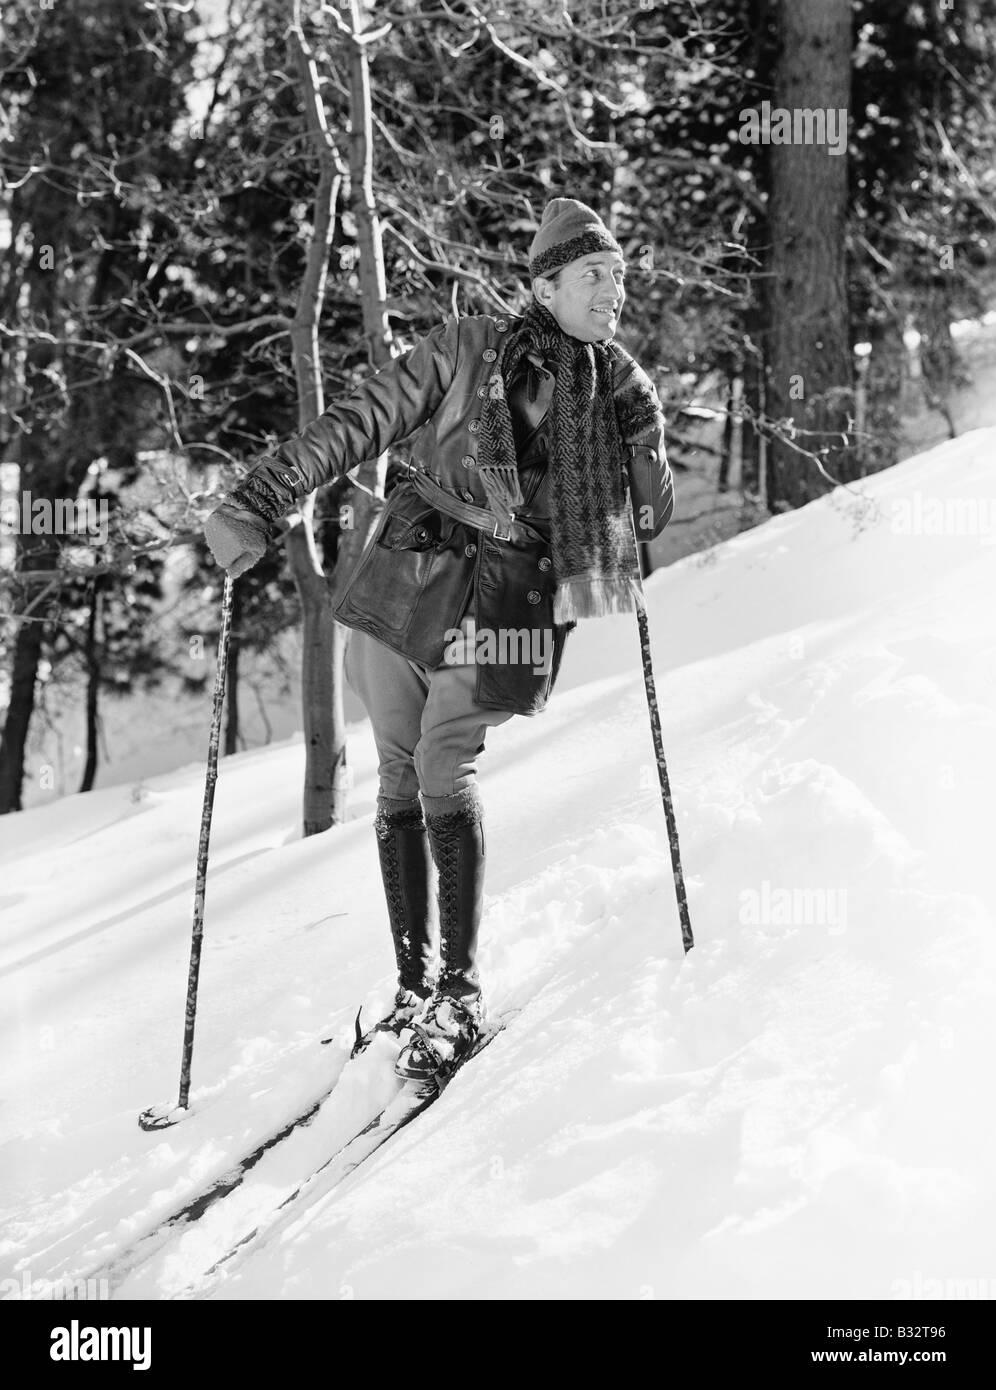 Ski alpin skieur masculin Photo Stock